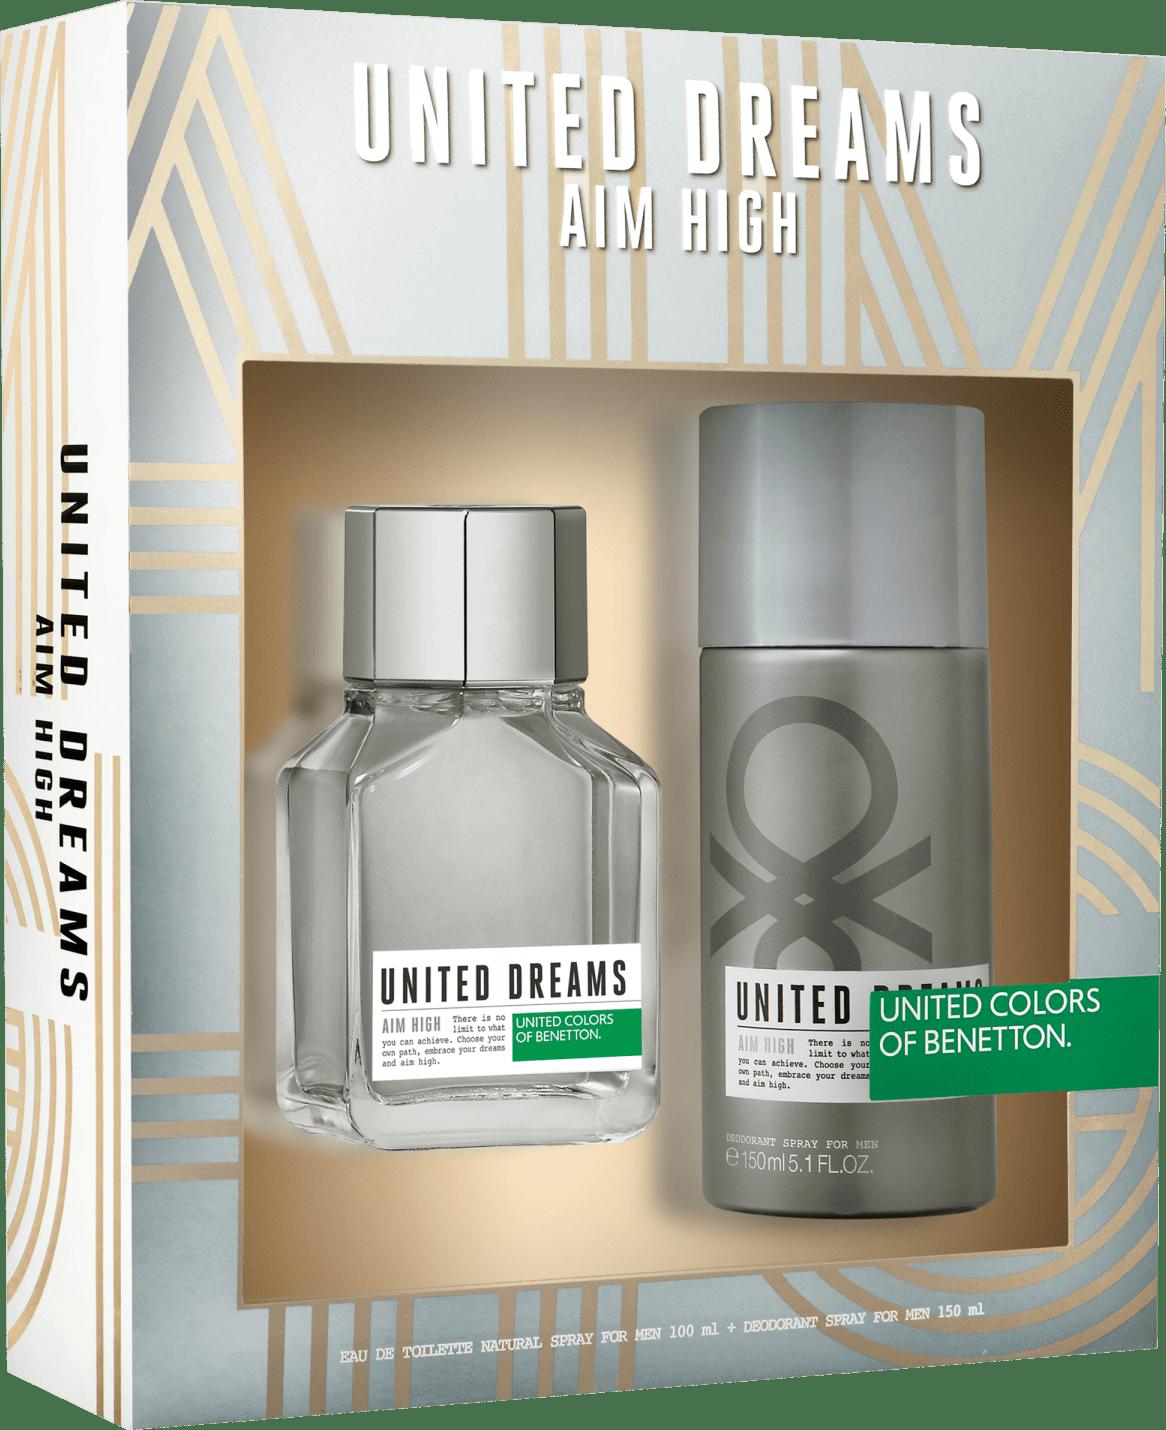 714a57067 Conjunto United Dreams Aim High Benetton Masculino - Eau de Toilette 100ml  + Desodorante 150ml